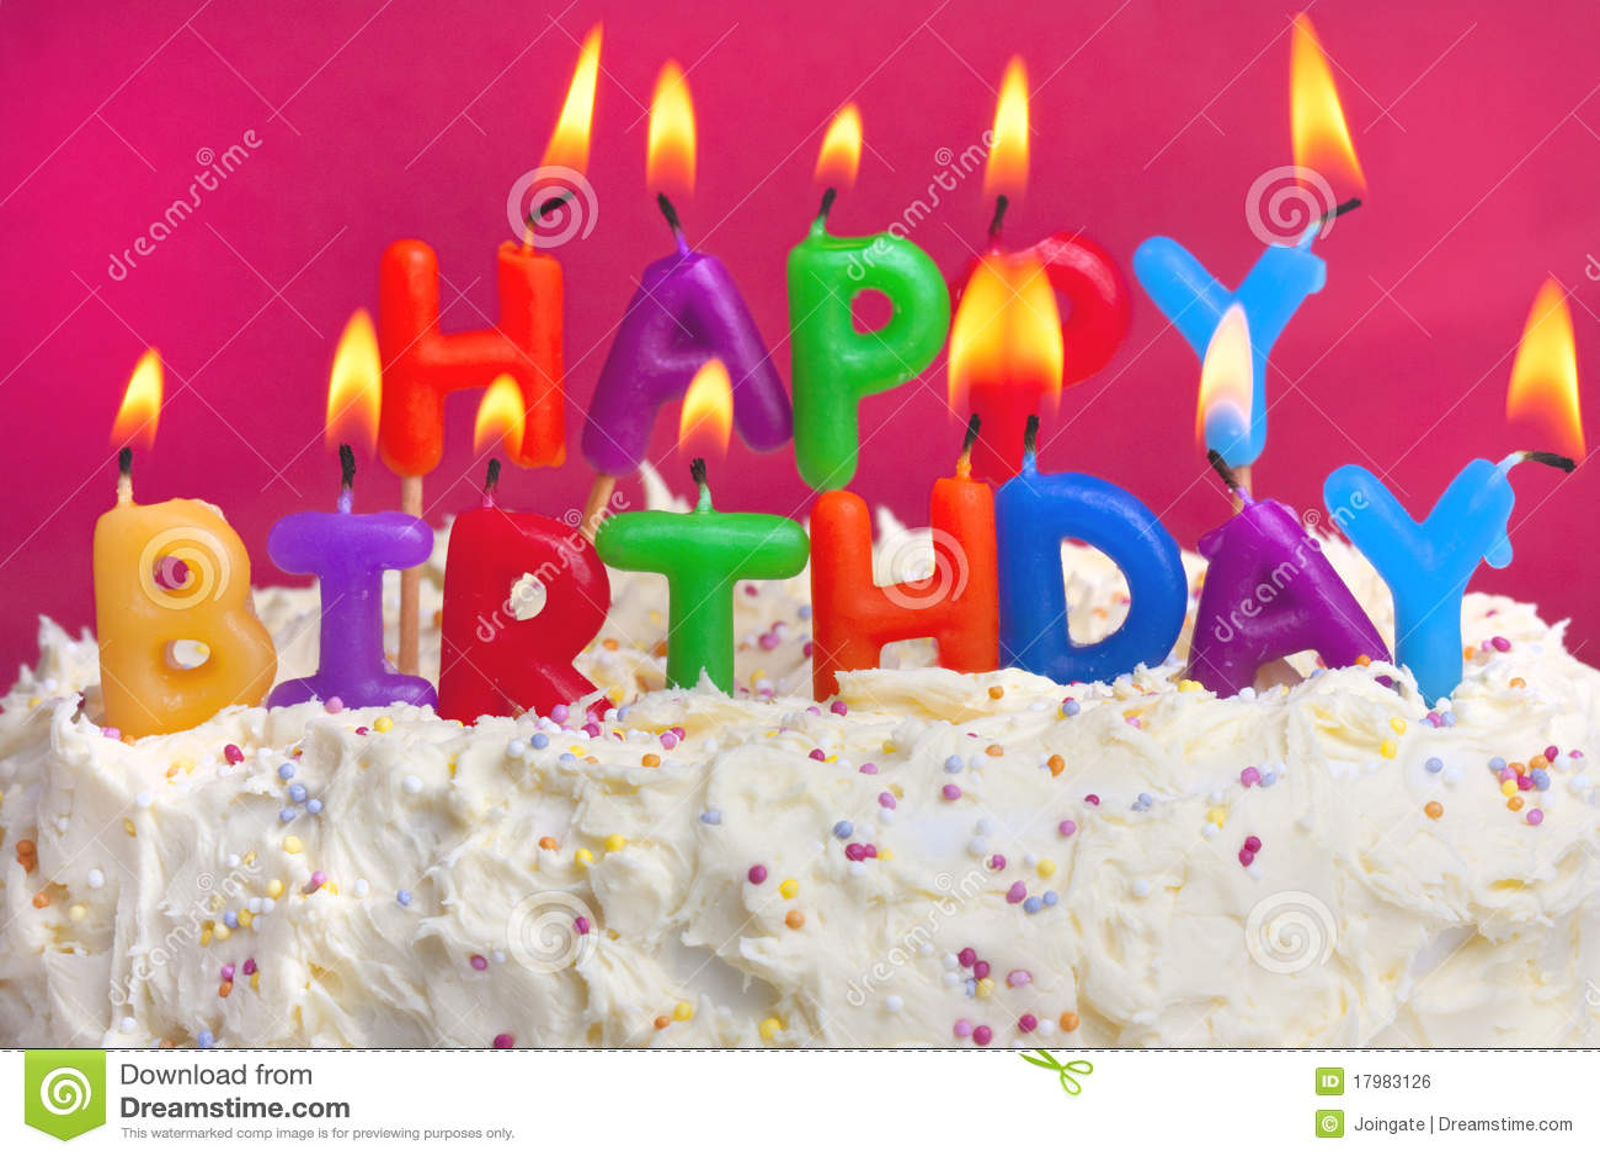 Happy birthday cake stock photo  Image of cake, pink - 17983126